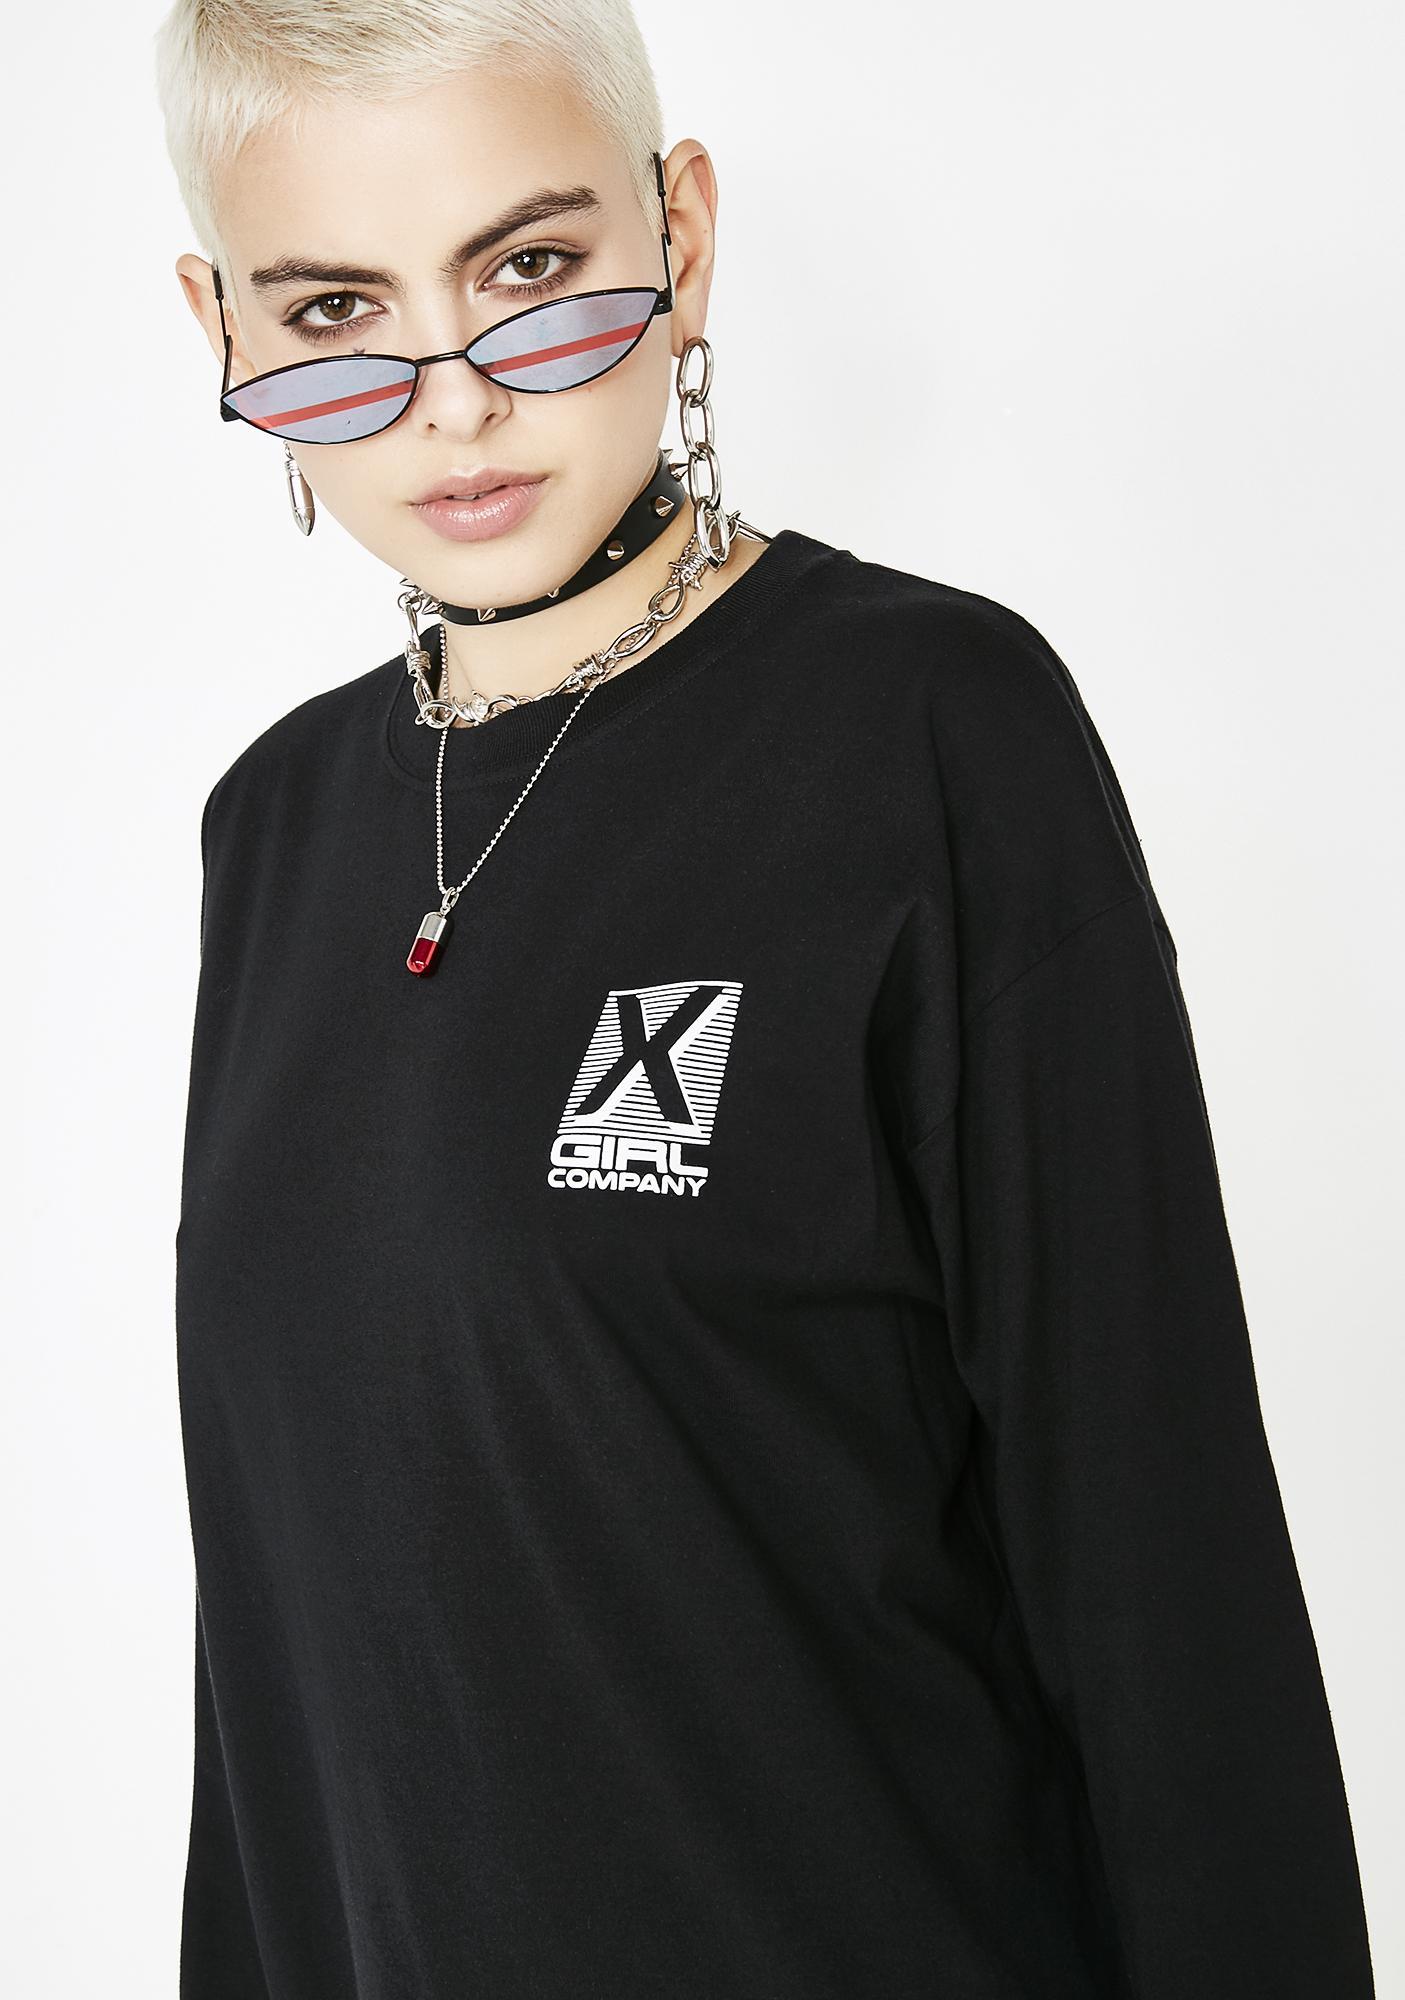 x-Girl X-Girl Company Long Sleeve Tee